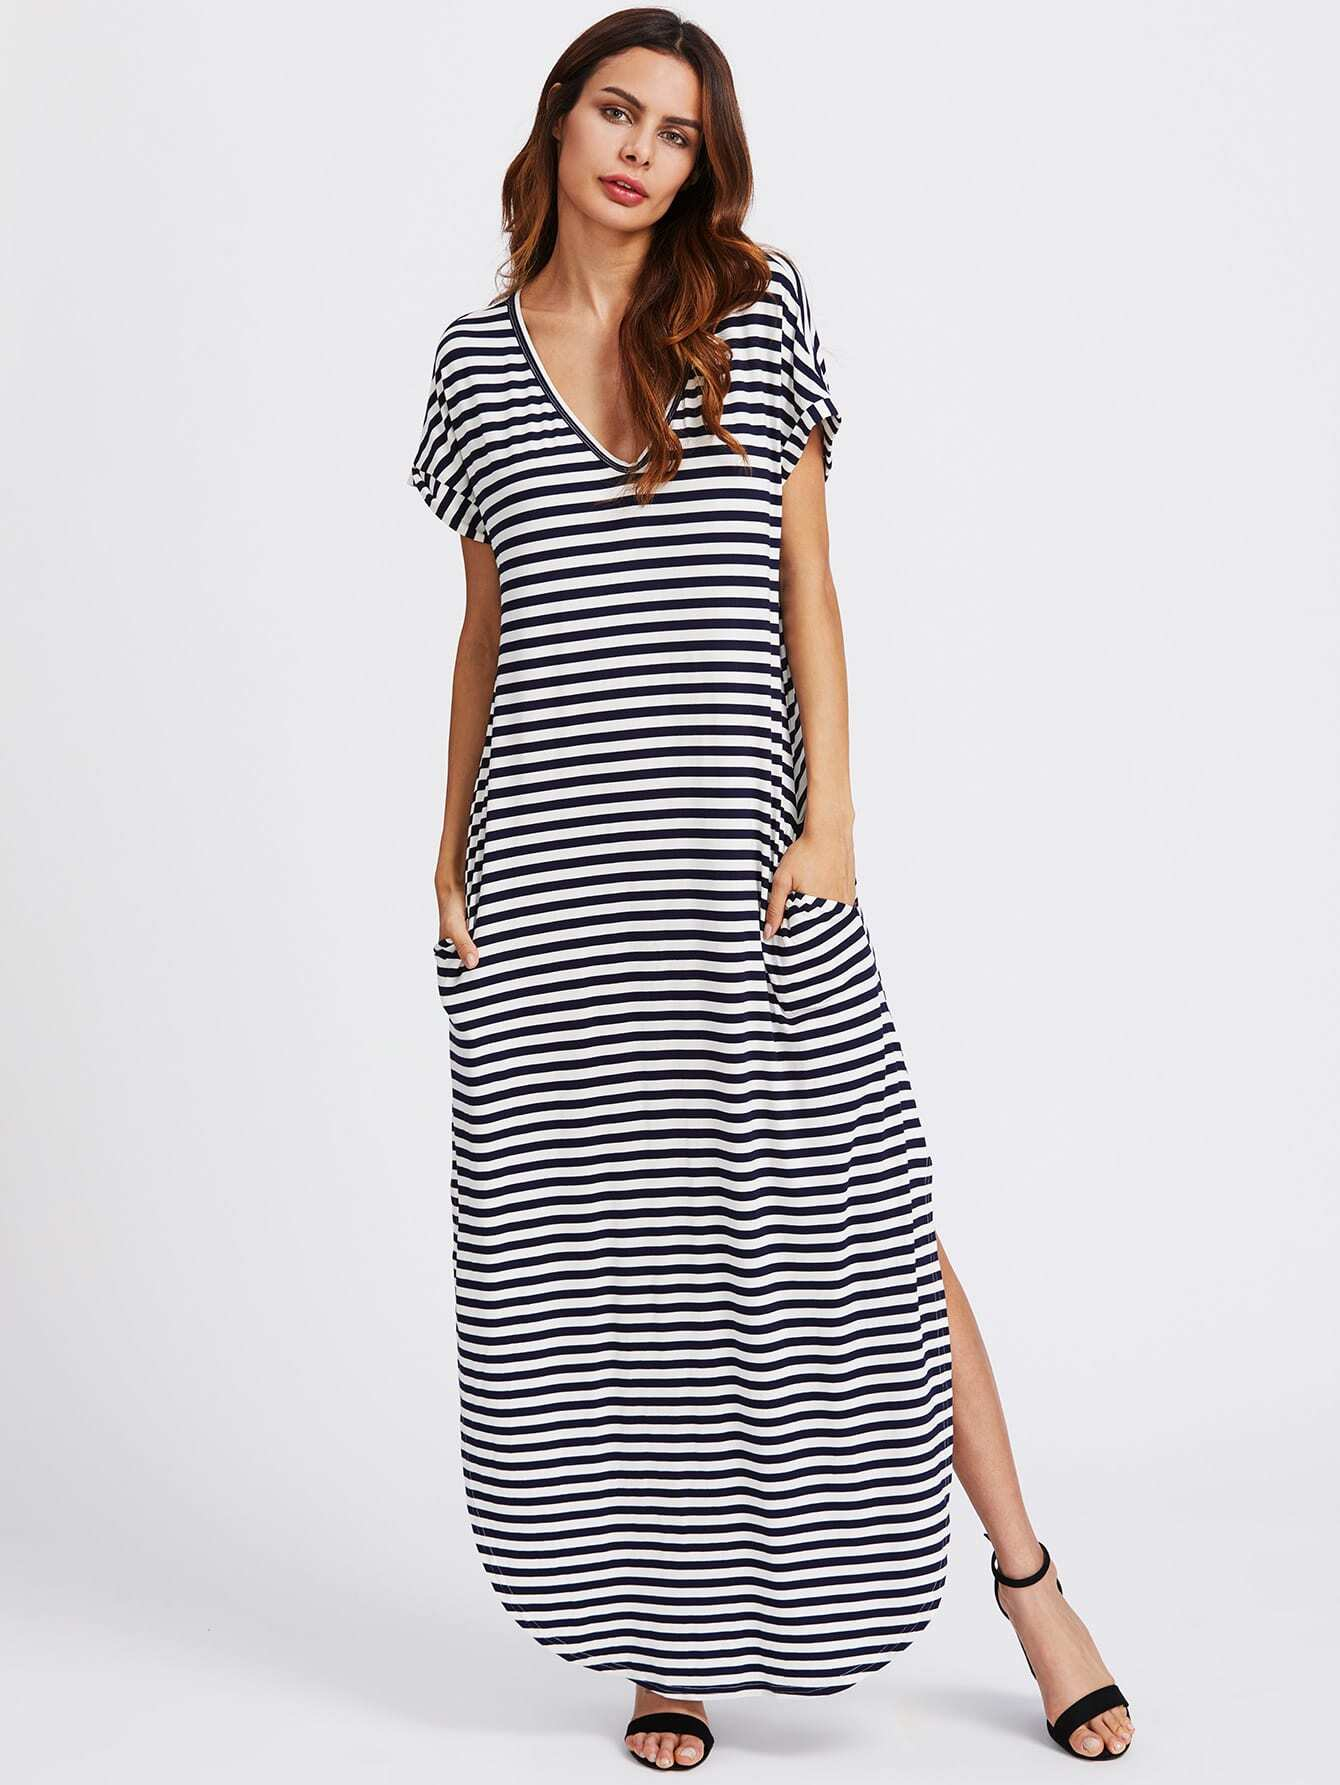 52d750c2 Slit Curved Hem Hidden Pocket Striped Tee Dress -SheIn(Sheinside)